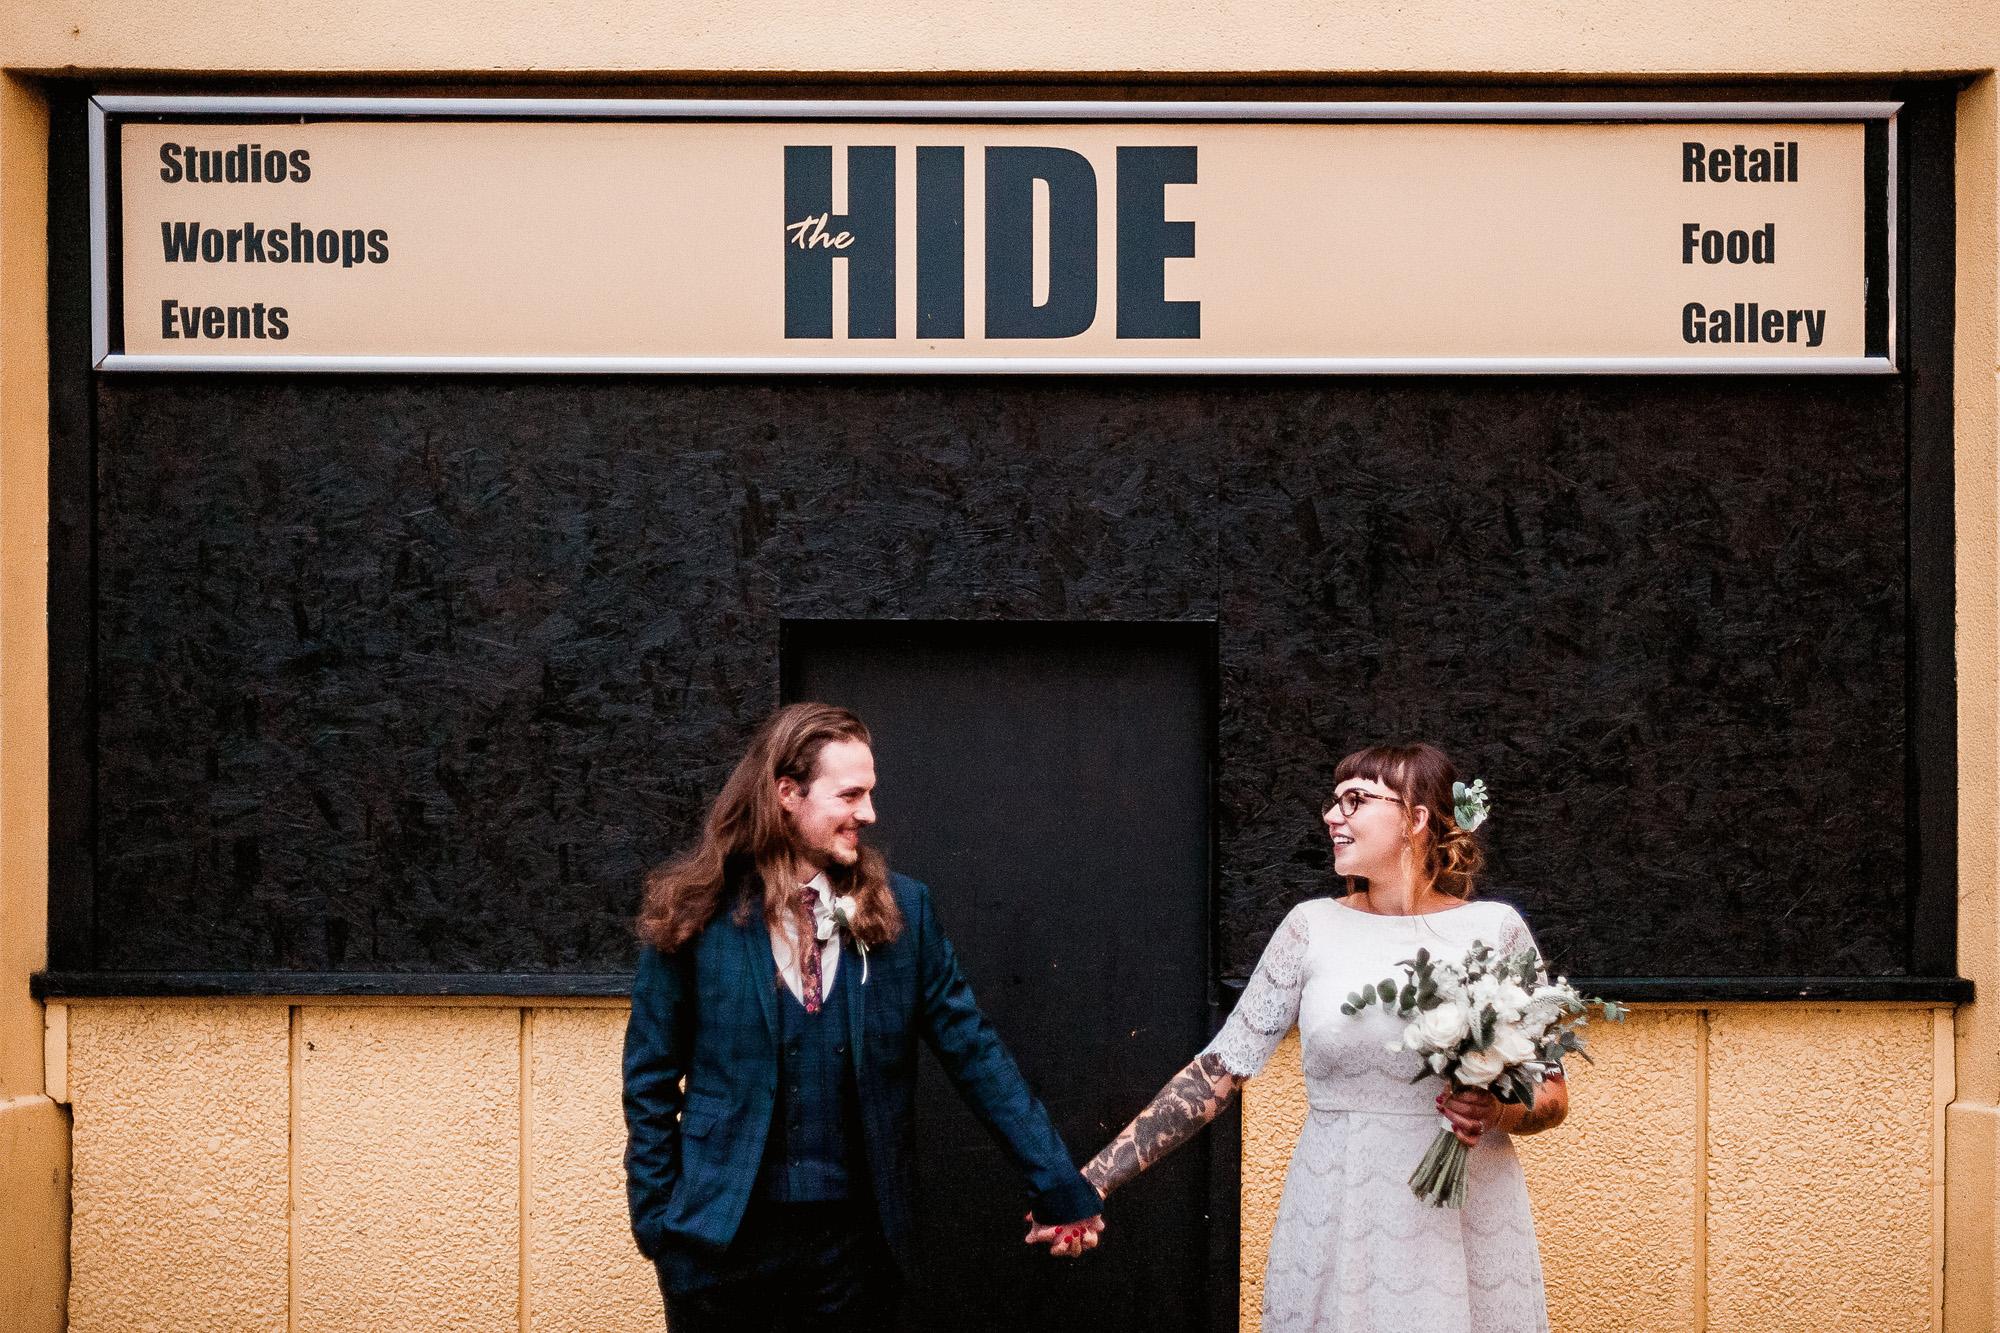 Harriet-Dahlia-Bespoke-Lace-Silk-Bohemian-Wedding-Dress-Sleeves-Tattooed-Bride-Alternative-Wedding-Sheffield-38.jpg